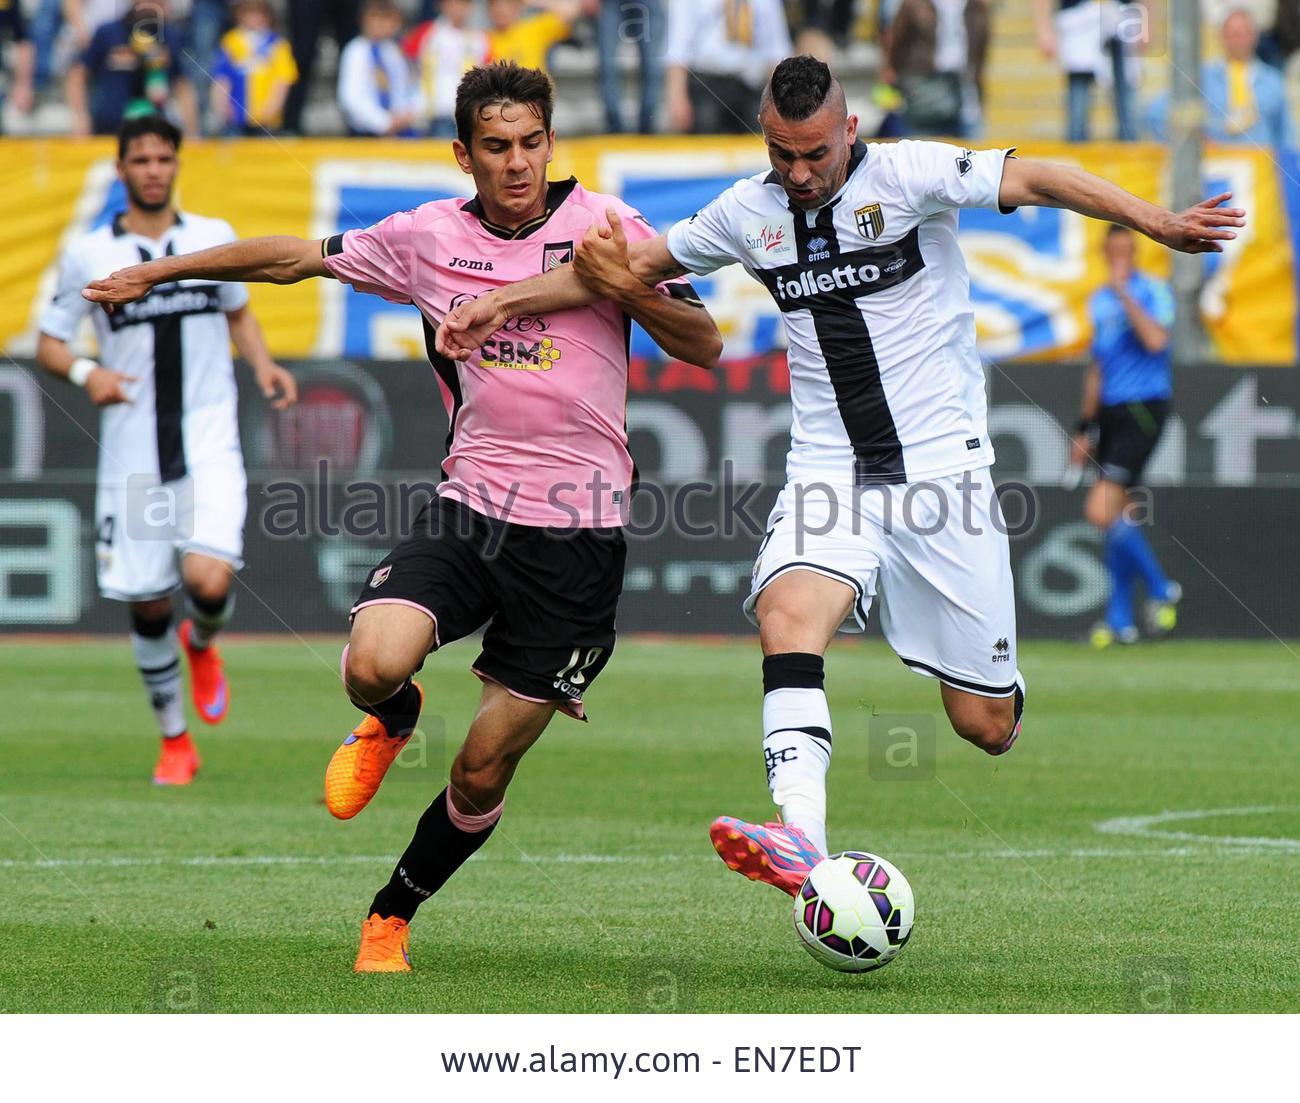 Parma FC vs US Palermo